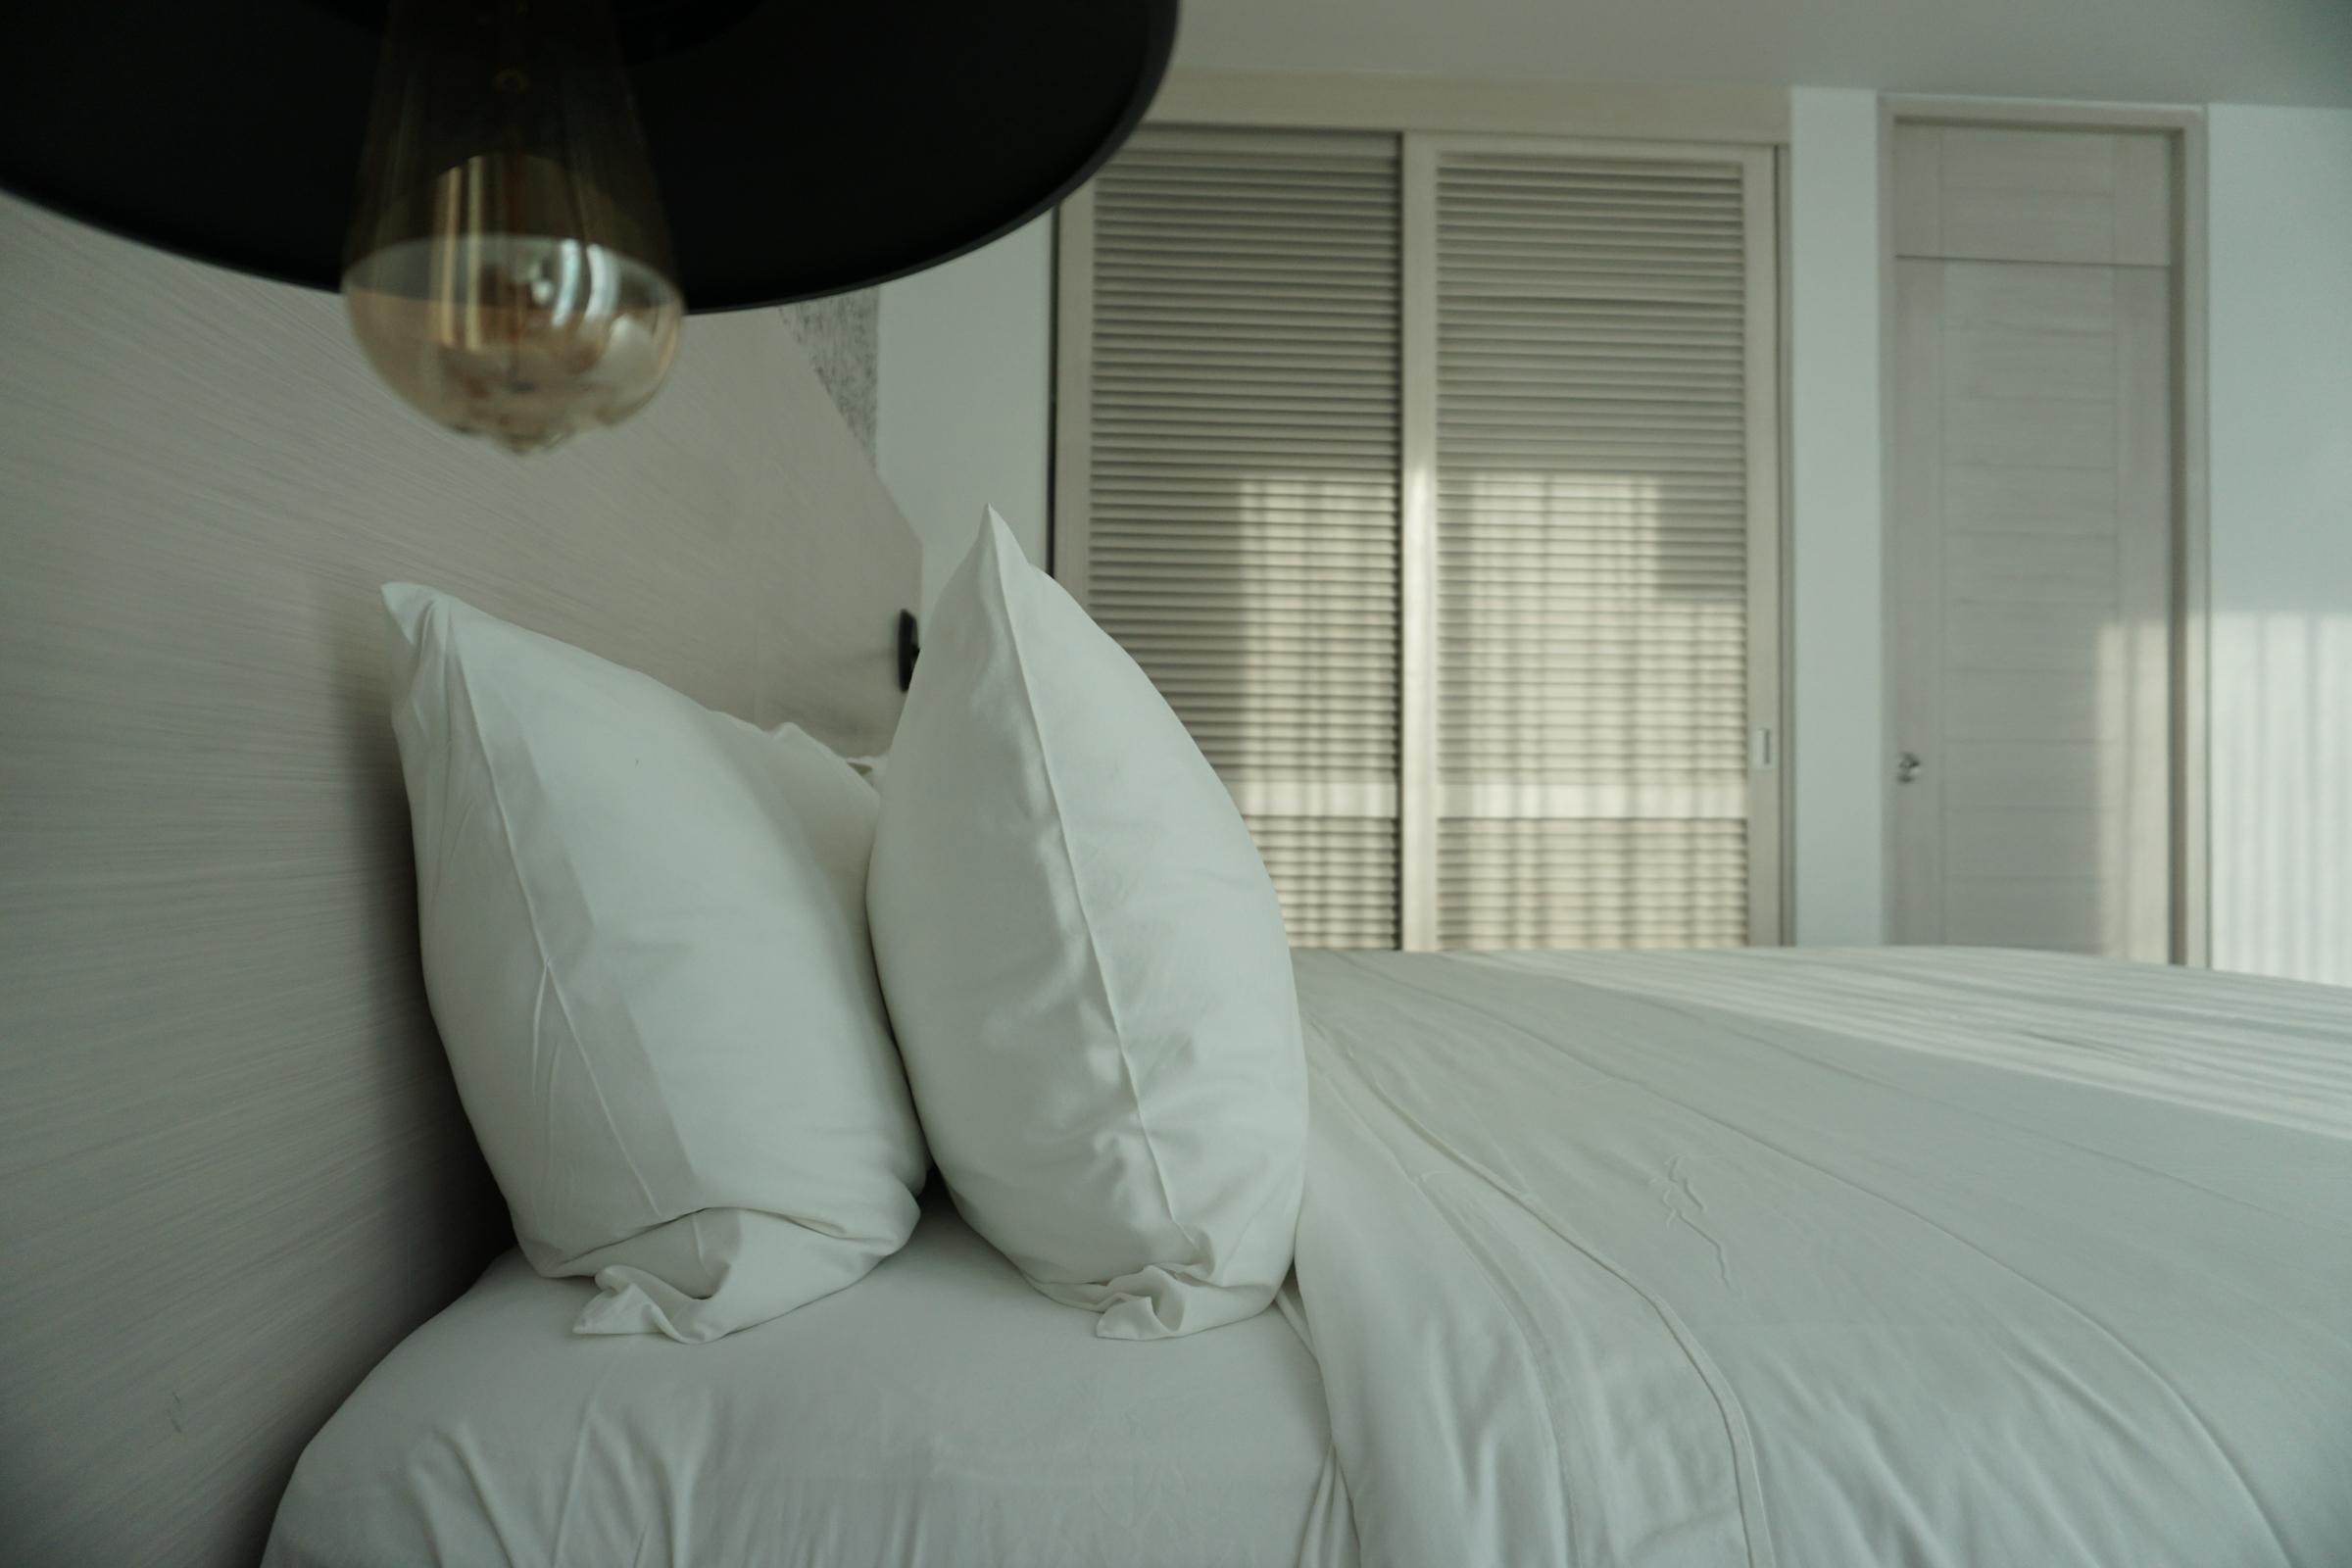 where-to-go-on-holiday-cancun-hotel-oleo-mexico-minas-planet-jamesgreen25.jpg